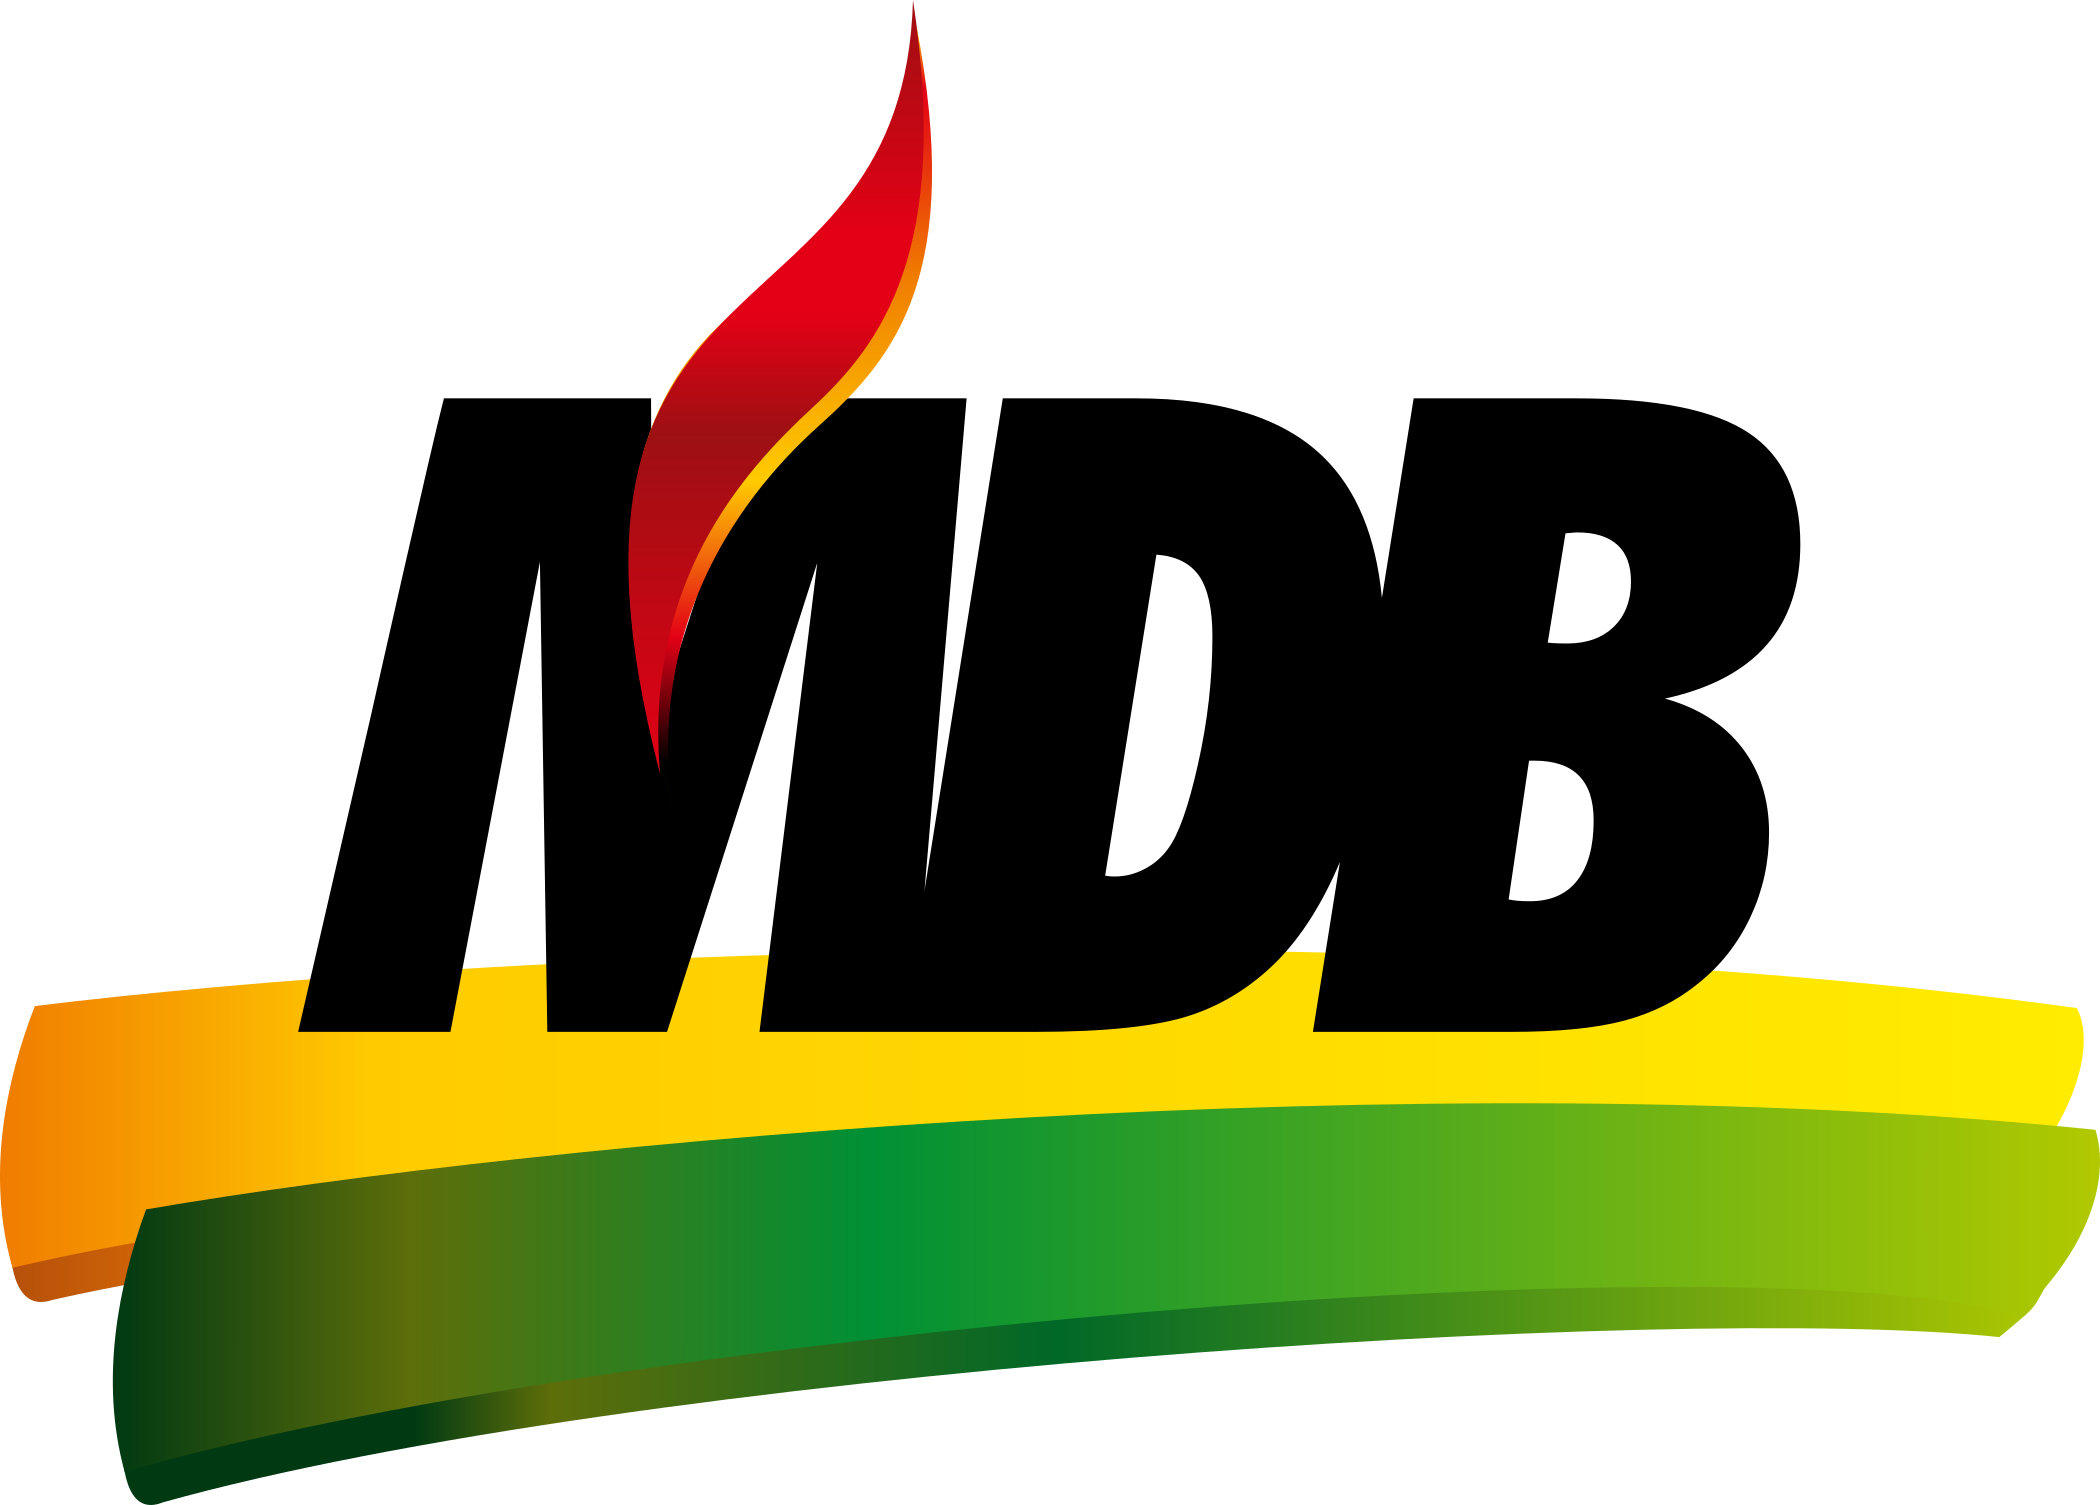 mdb logo partido 1 - MDB Logo - Movimento Democrático Brasileiro Logo